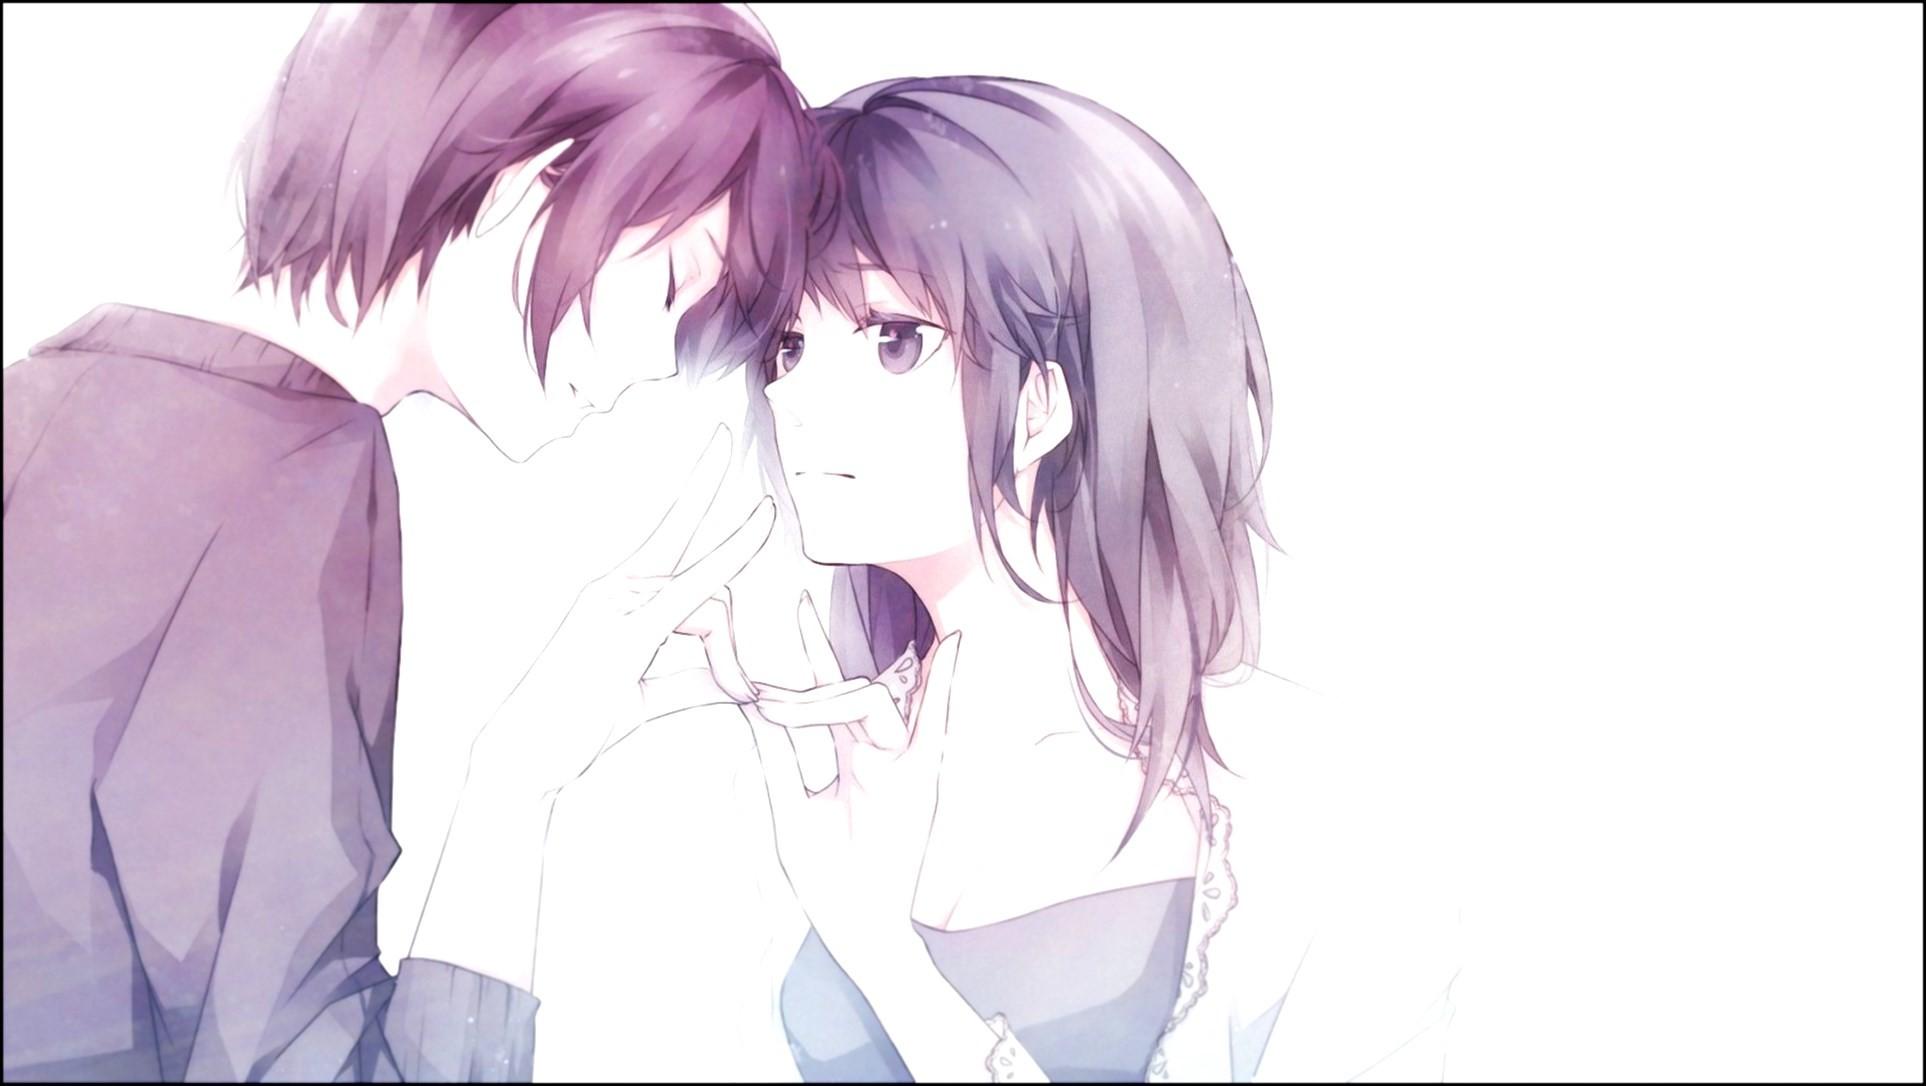 cute anime couple hd wallpaper